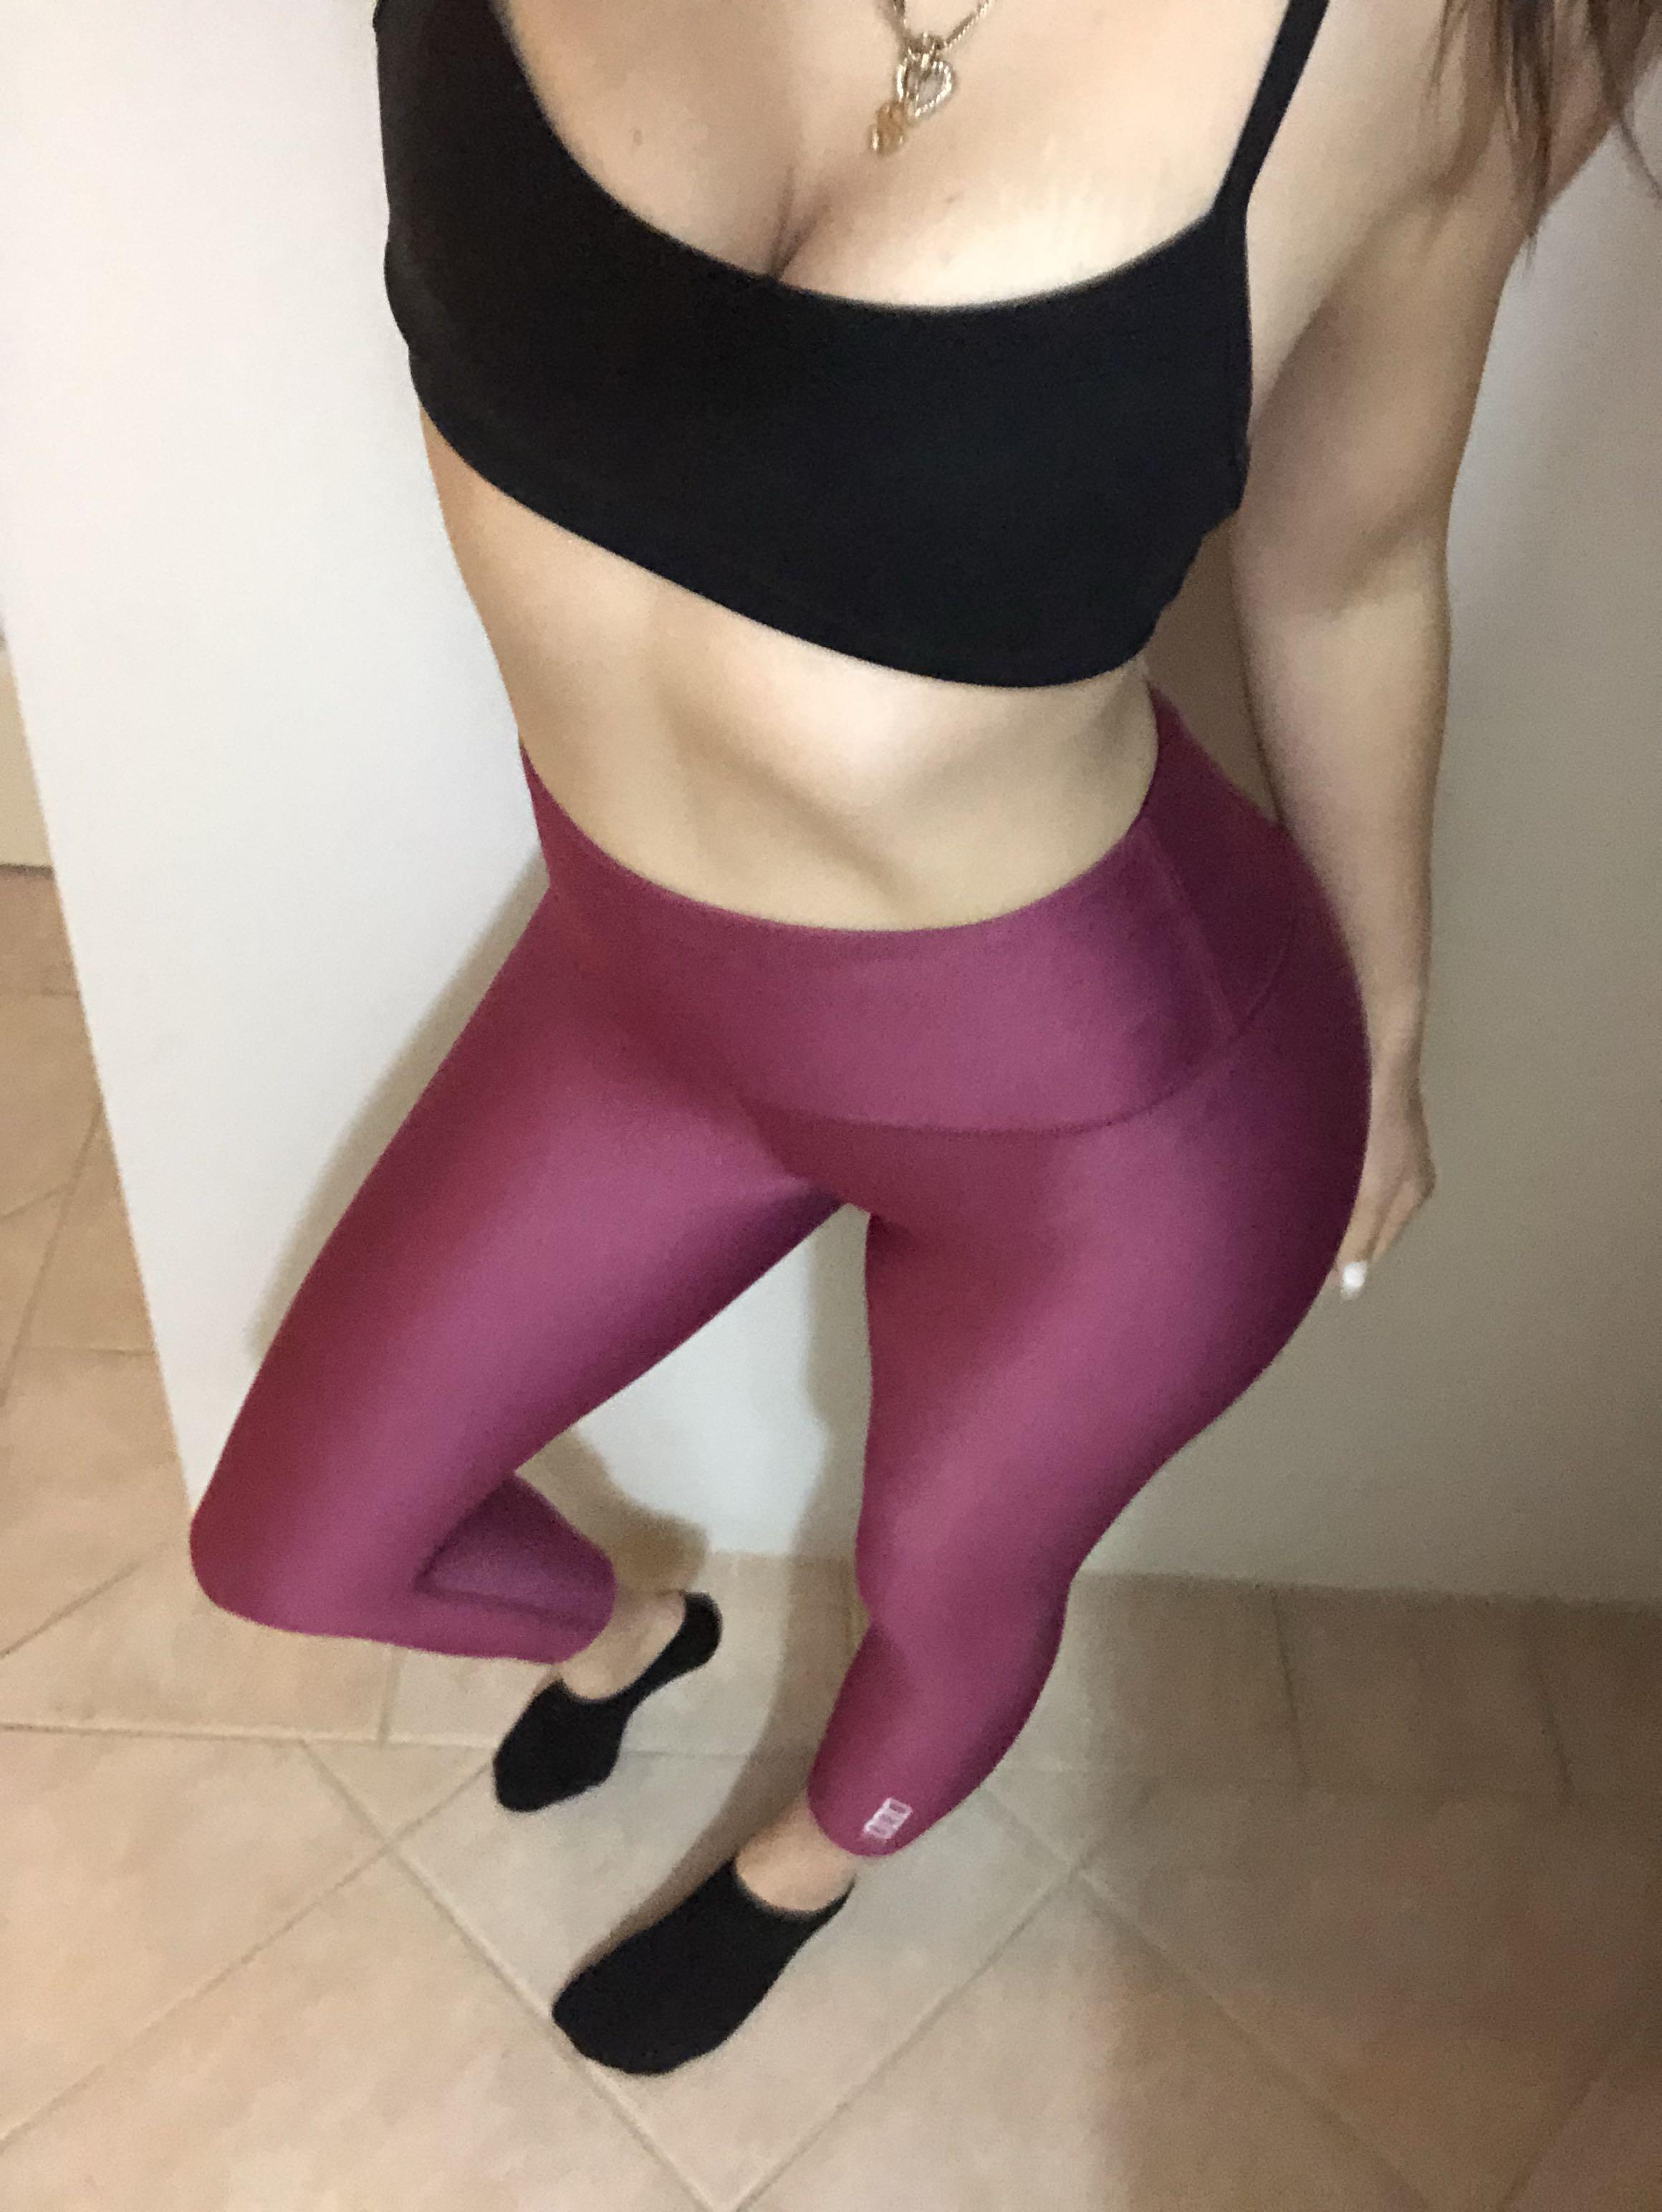 Lorna Jane High Waist 7/8 Leggings in Magenta XS (AU 6-8)